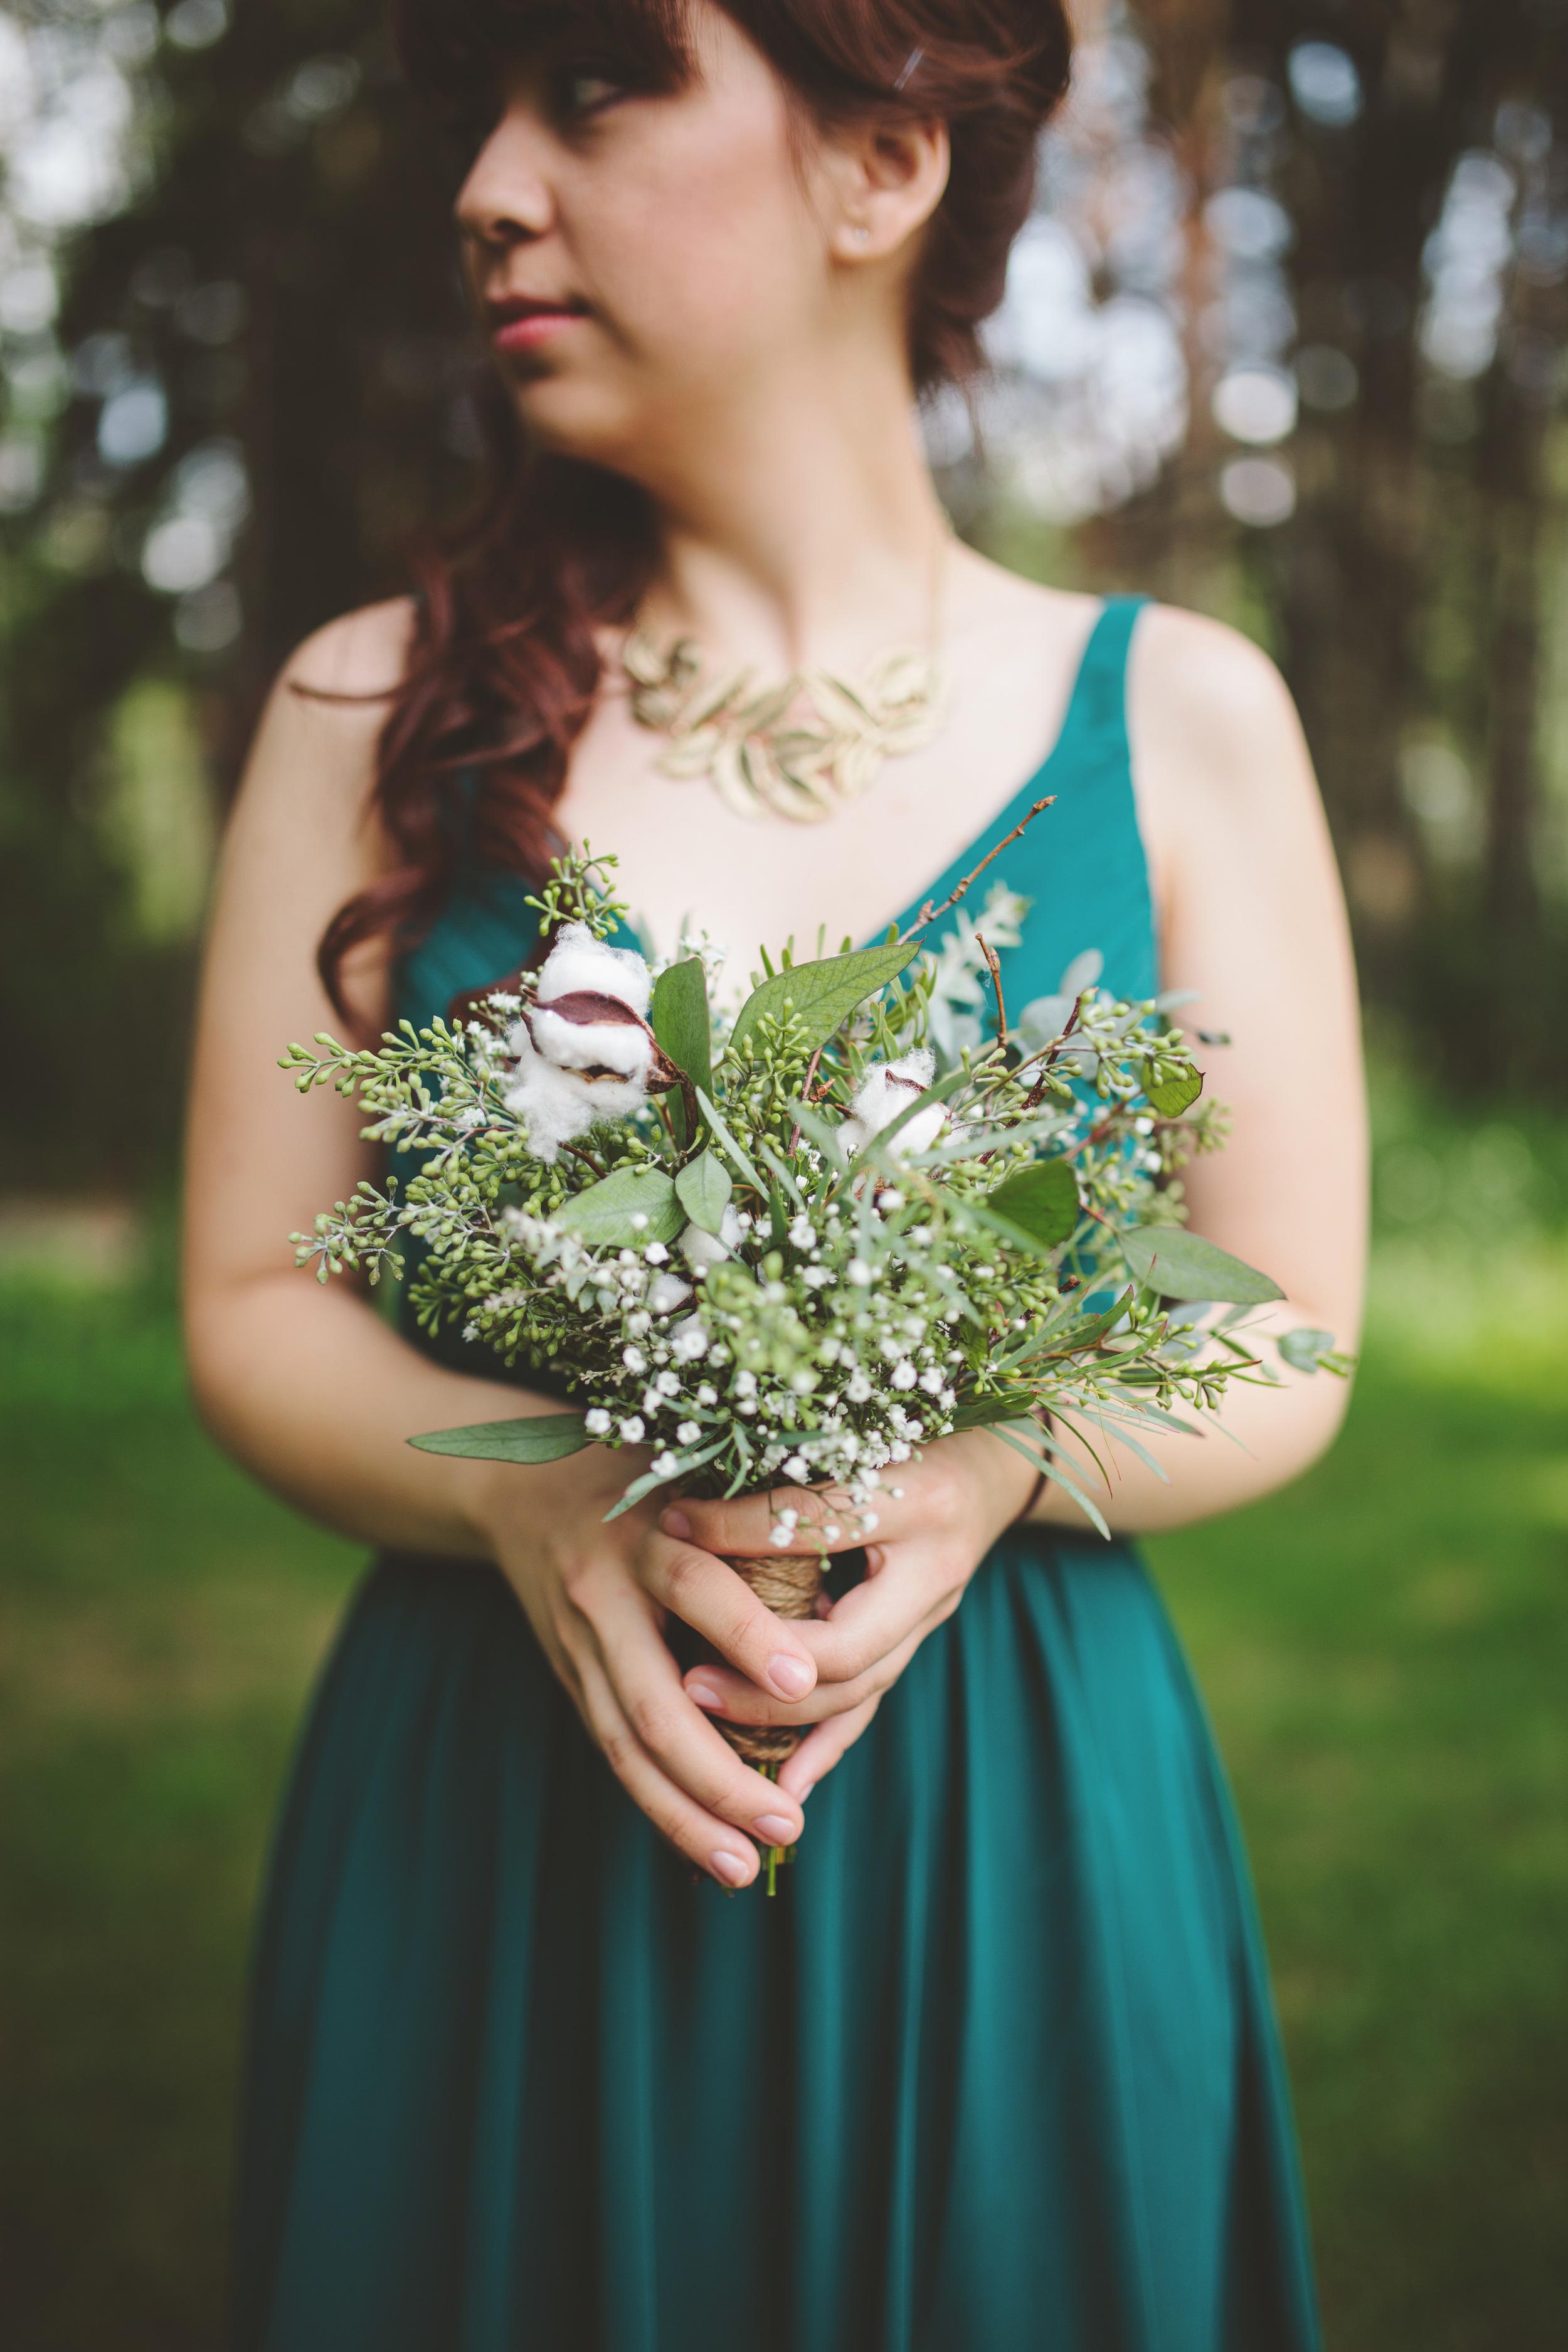 the-bees-knees-floral-design-studio-brainerd-mn-minnesota-florist-wedding-weddings-bride-greenery-bouquet